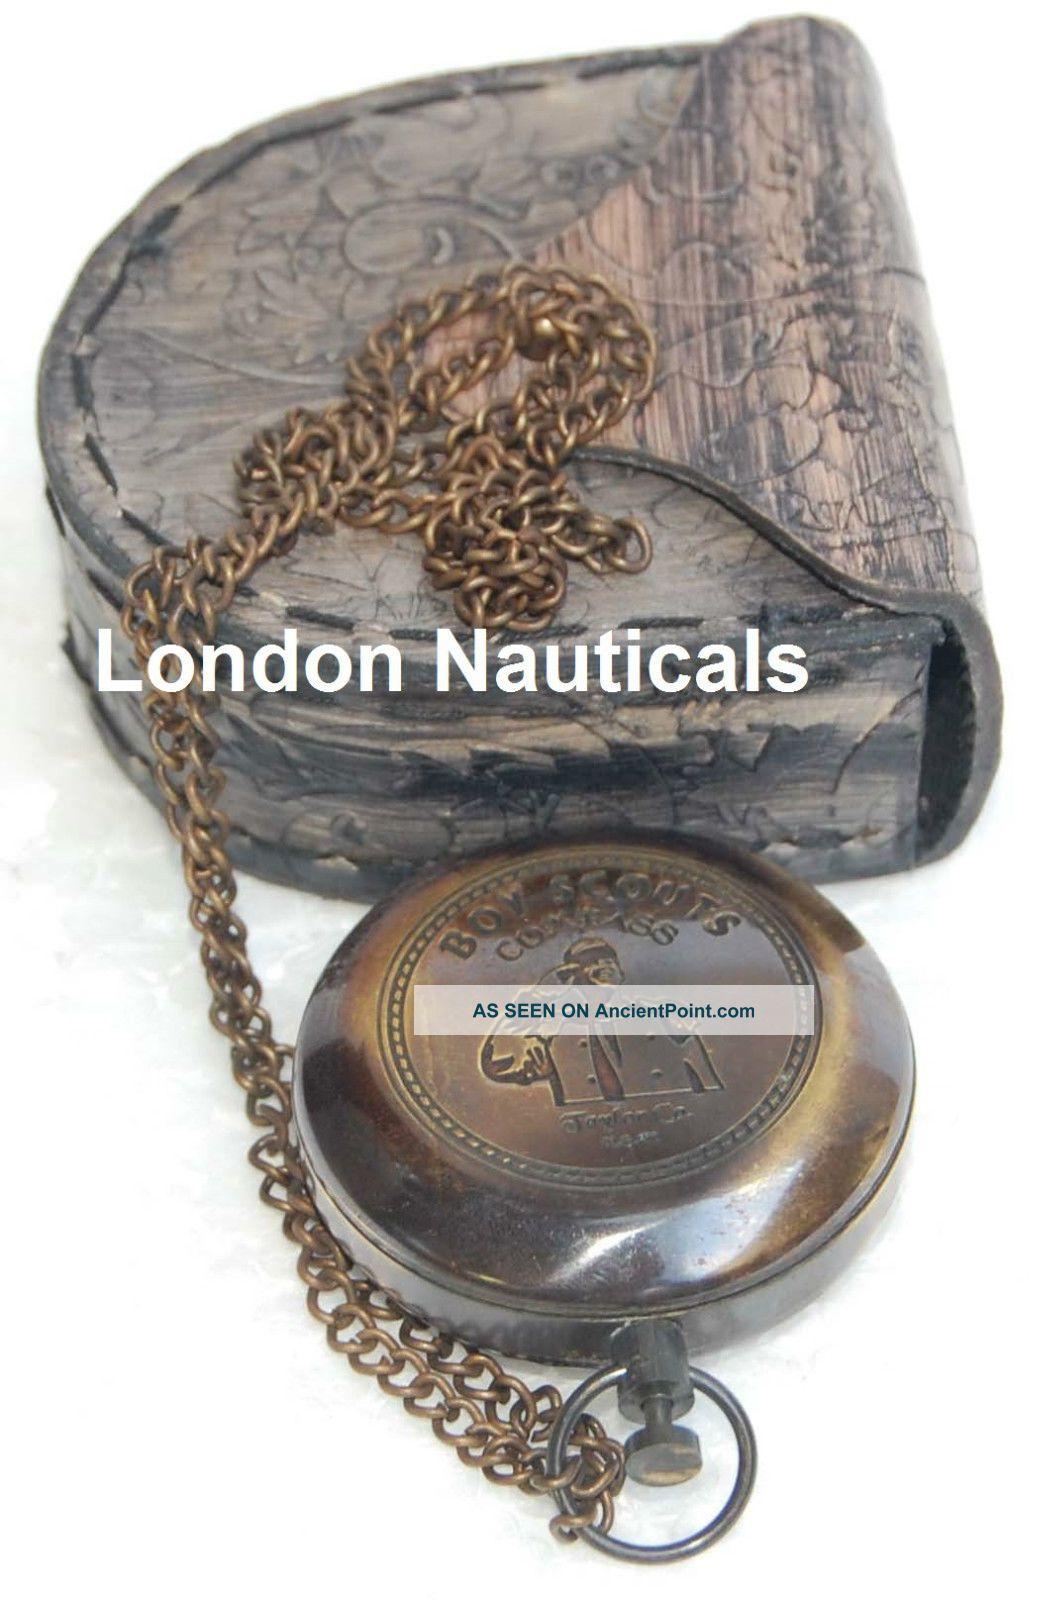 Antique Nautical Compass Vintage Compass Push Button Compass Brass Compass Gift Compasses photo